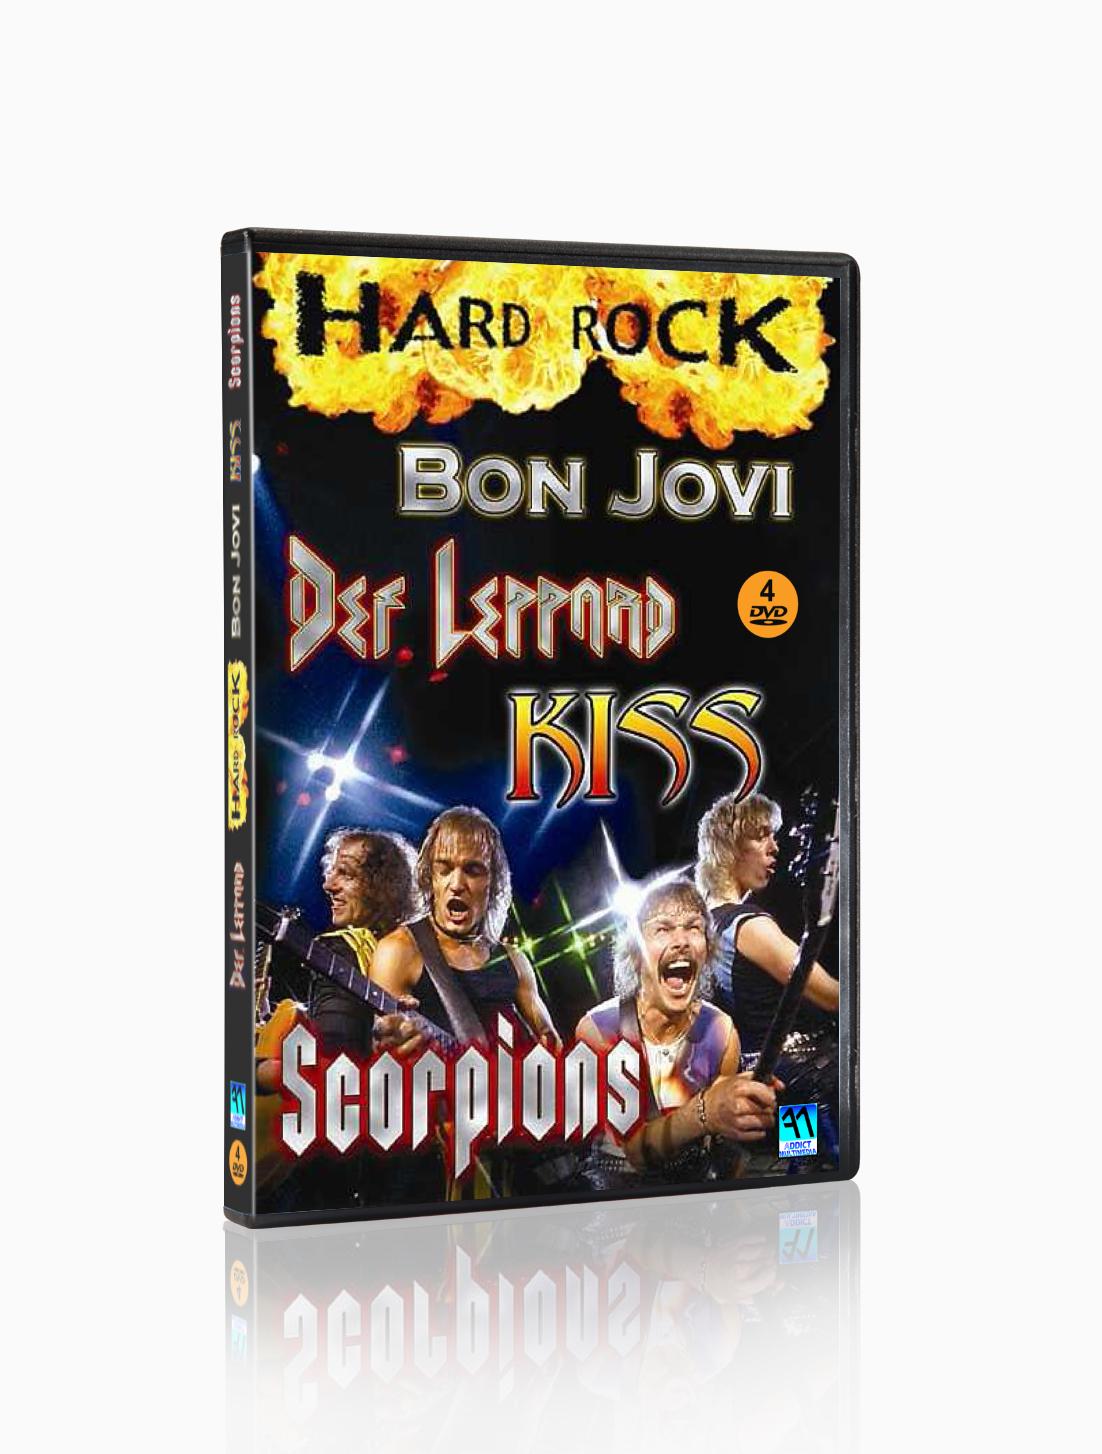 HARD ROCK - 4 DVD